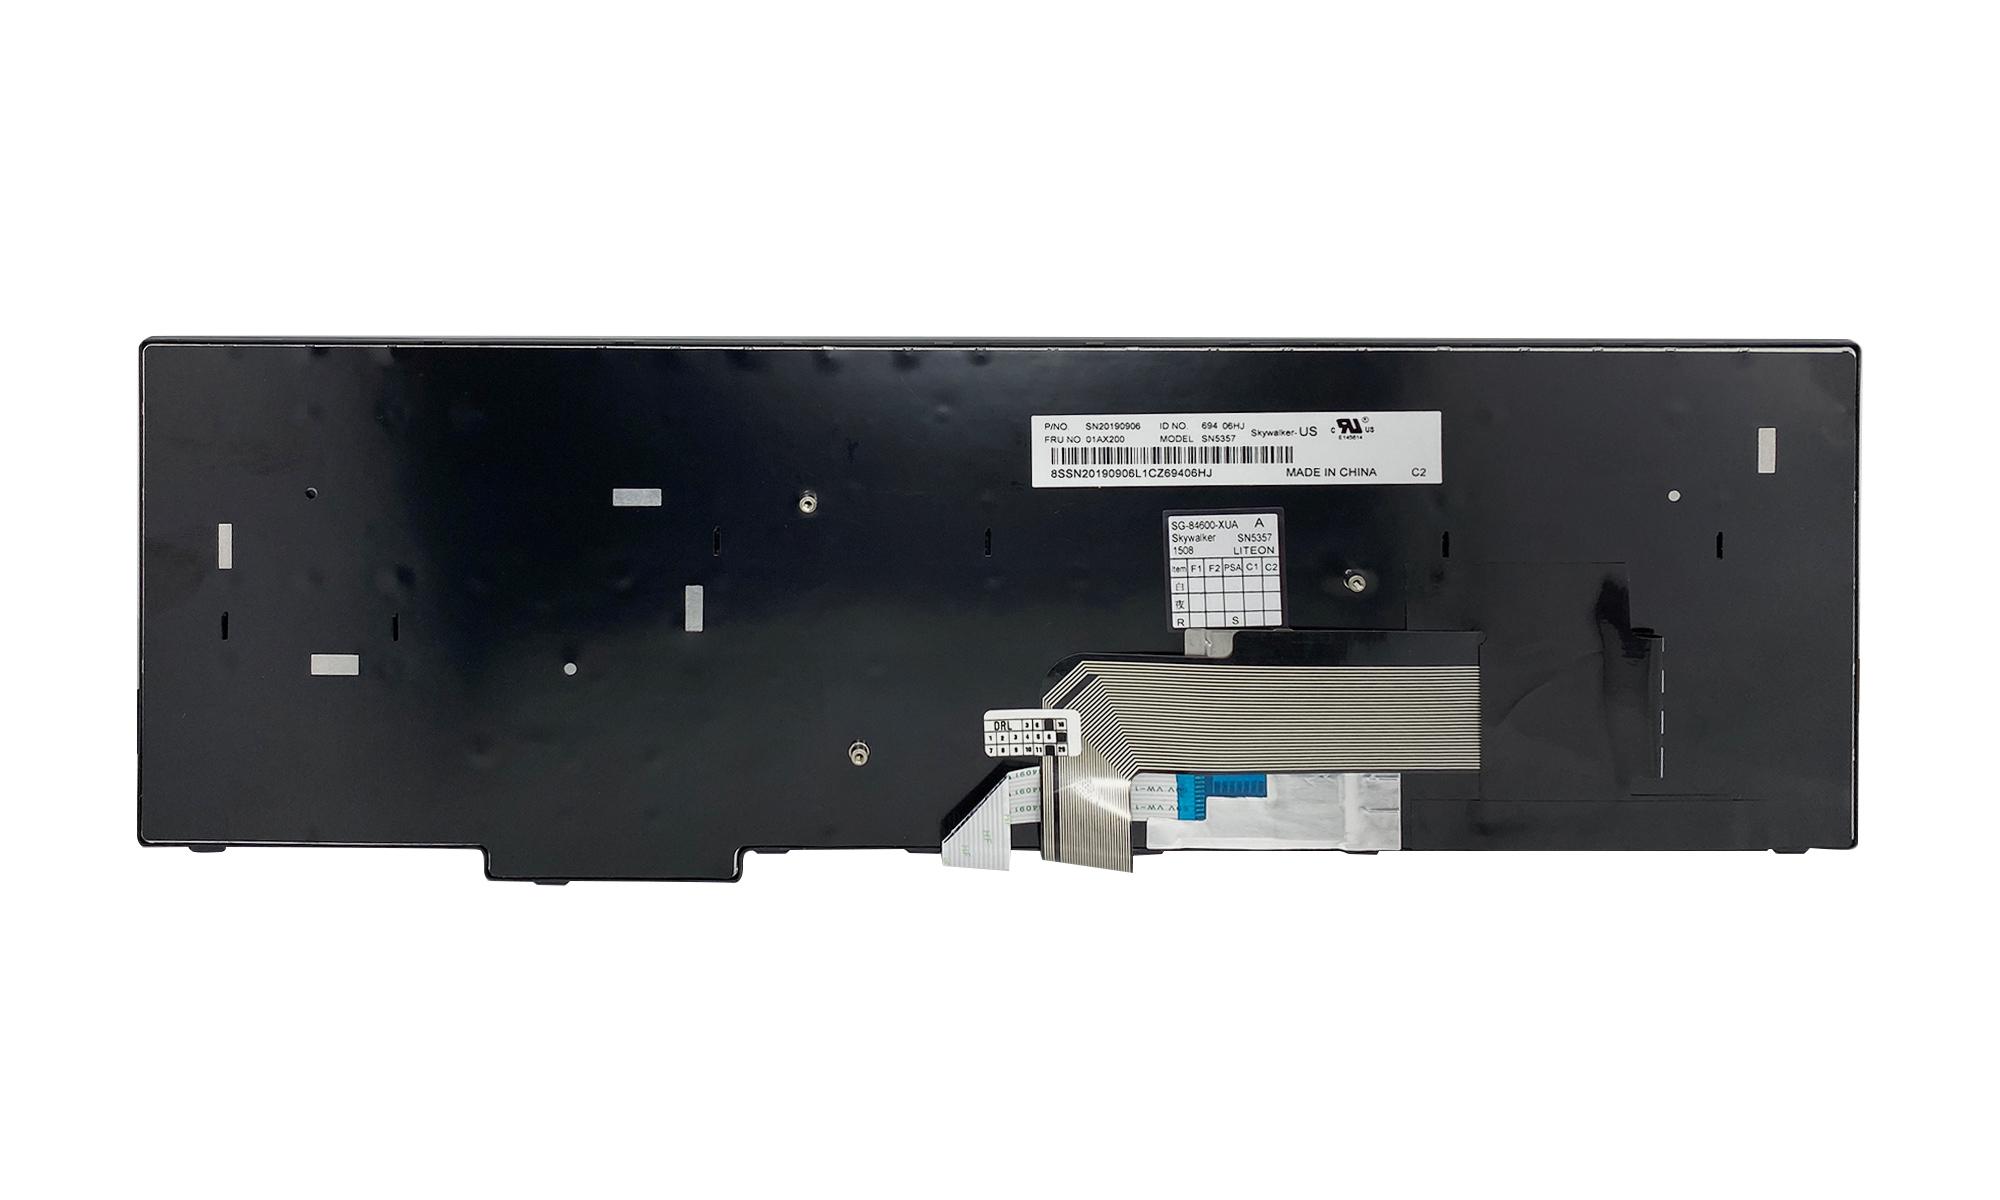 Tastatura compatibila Lenovo Thinkpad E570, E575, layout US, neagra, fara iluminare